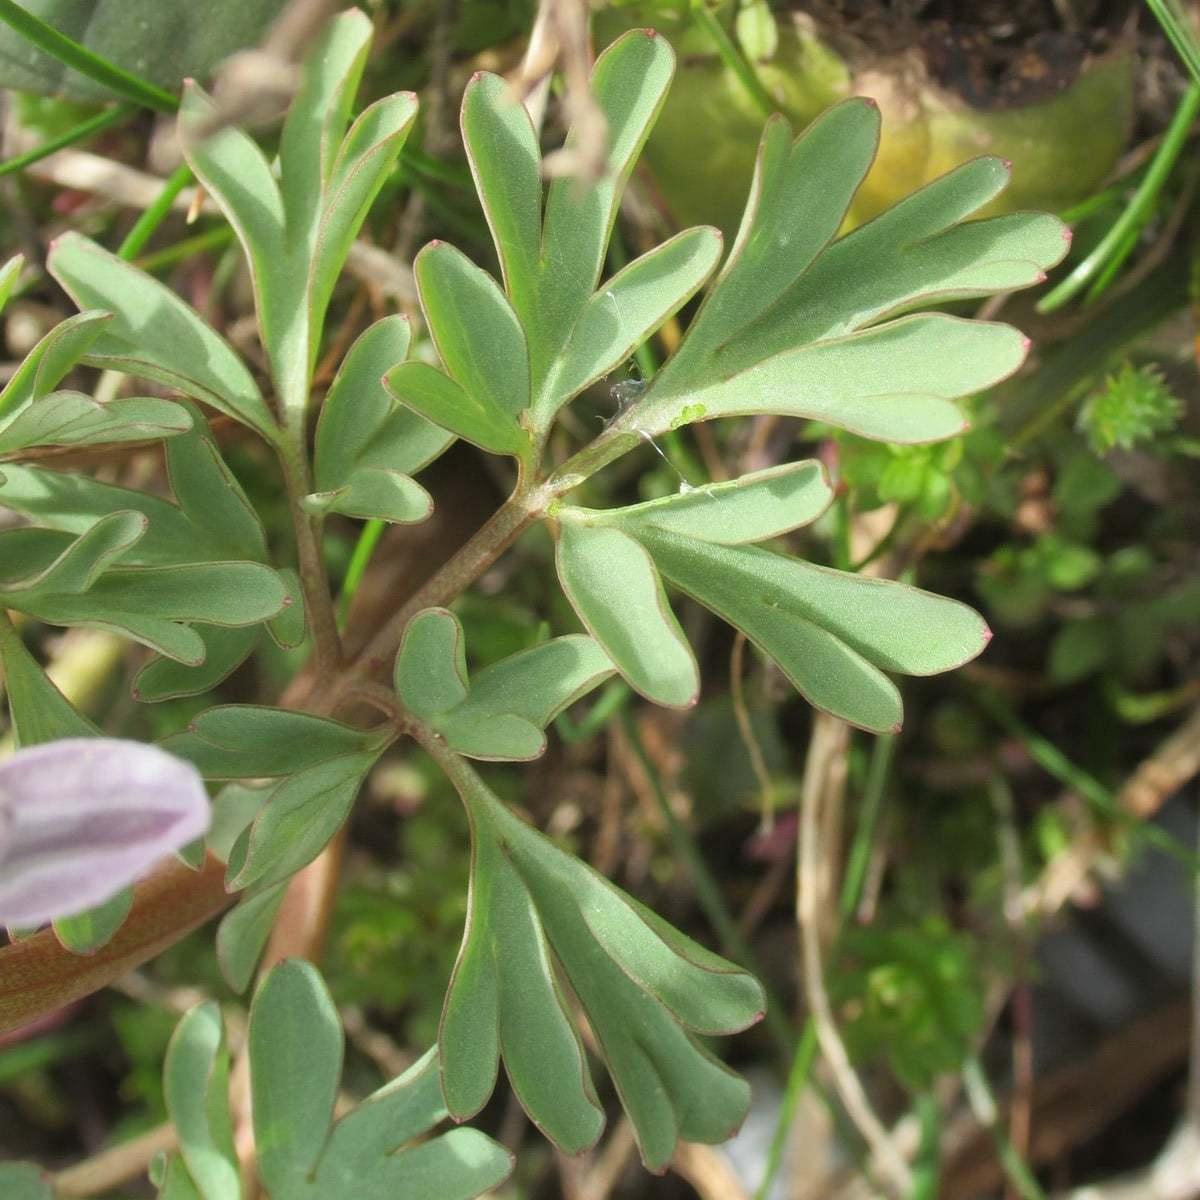 Corydalis wendelboi